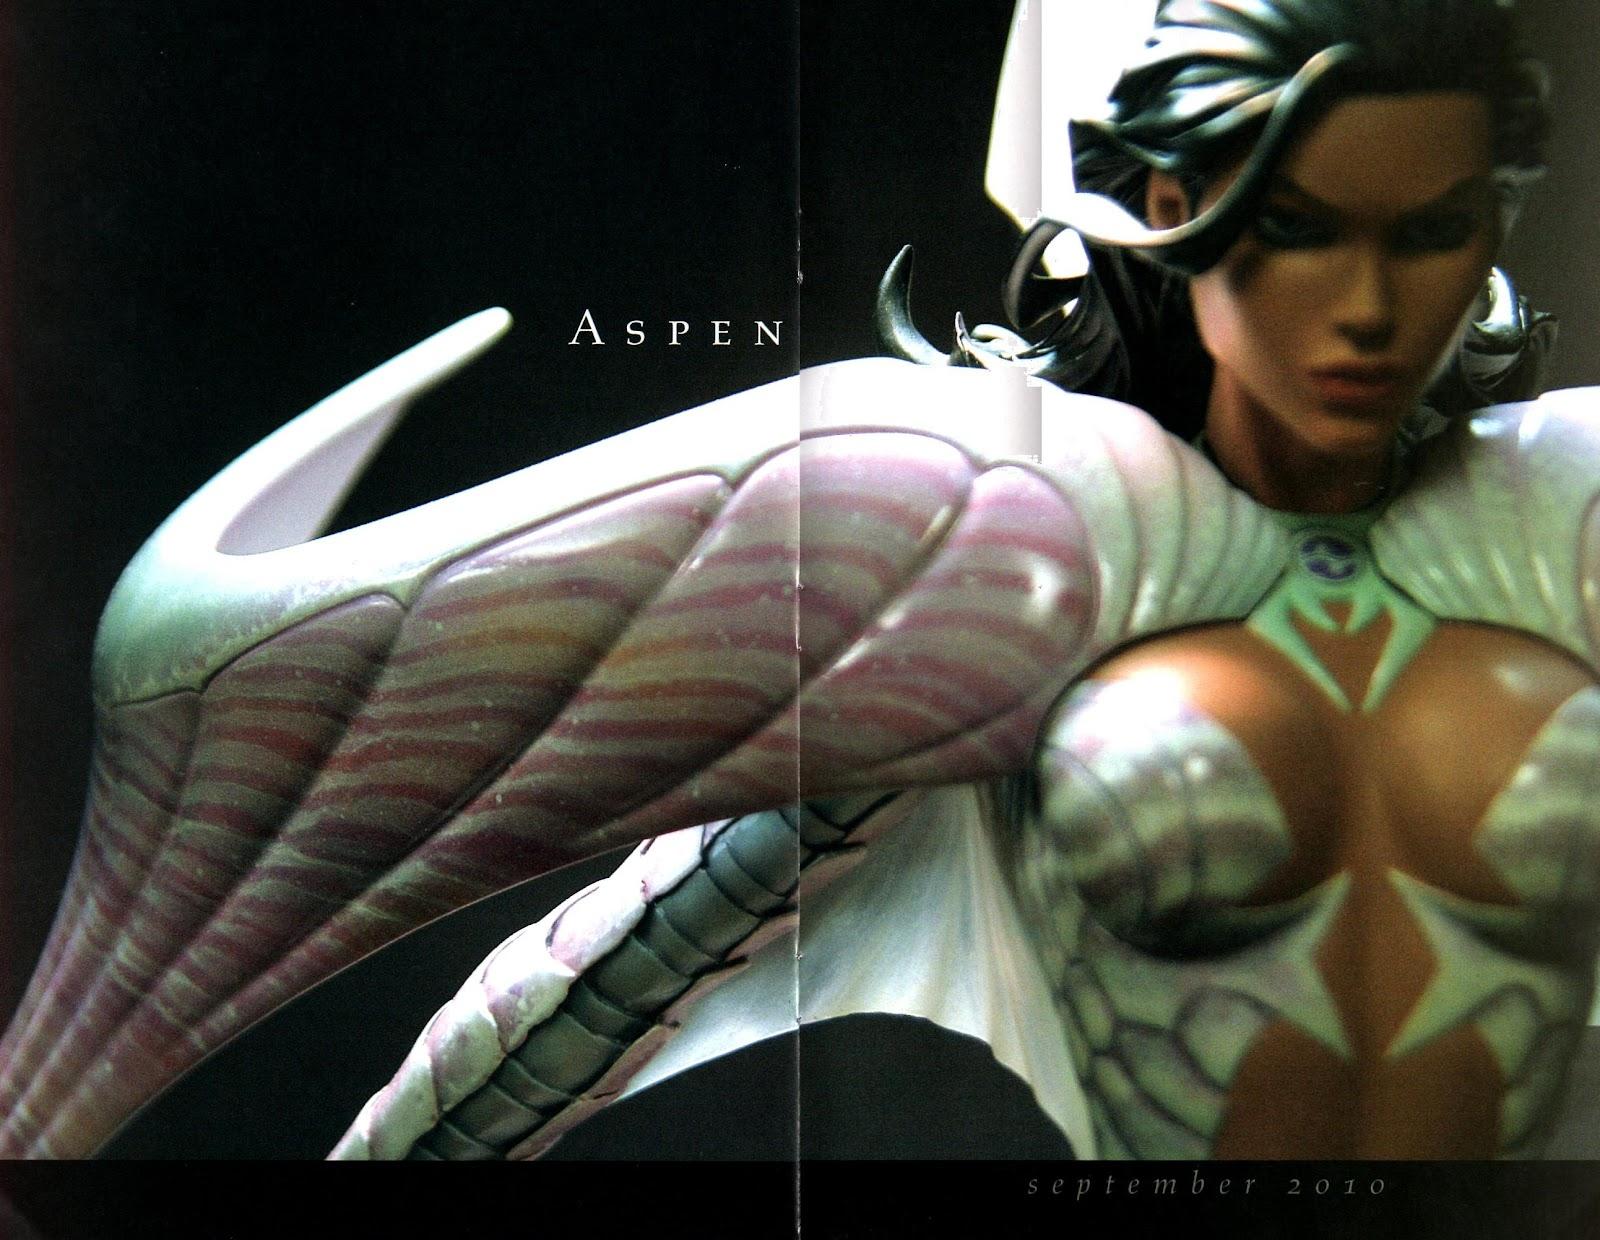 Read online Aspen Splash: Swimsuit Spectacular comic -  Issue # Issue 2010 - 15